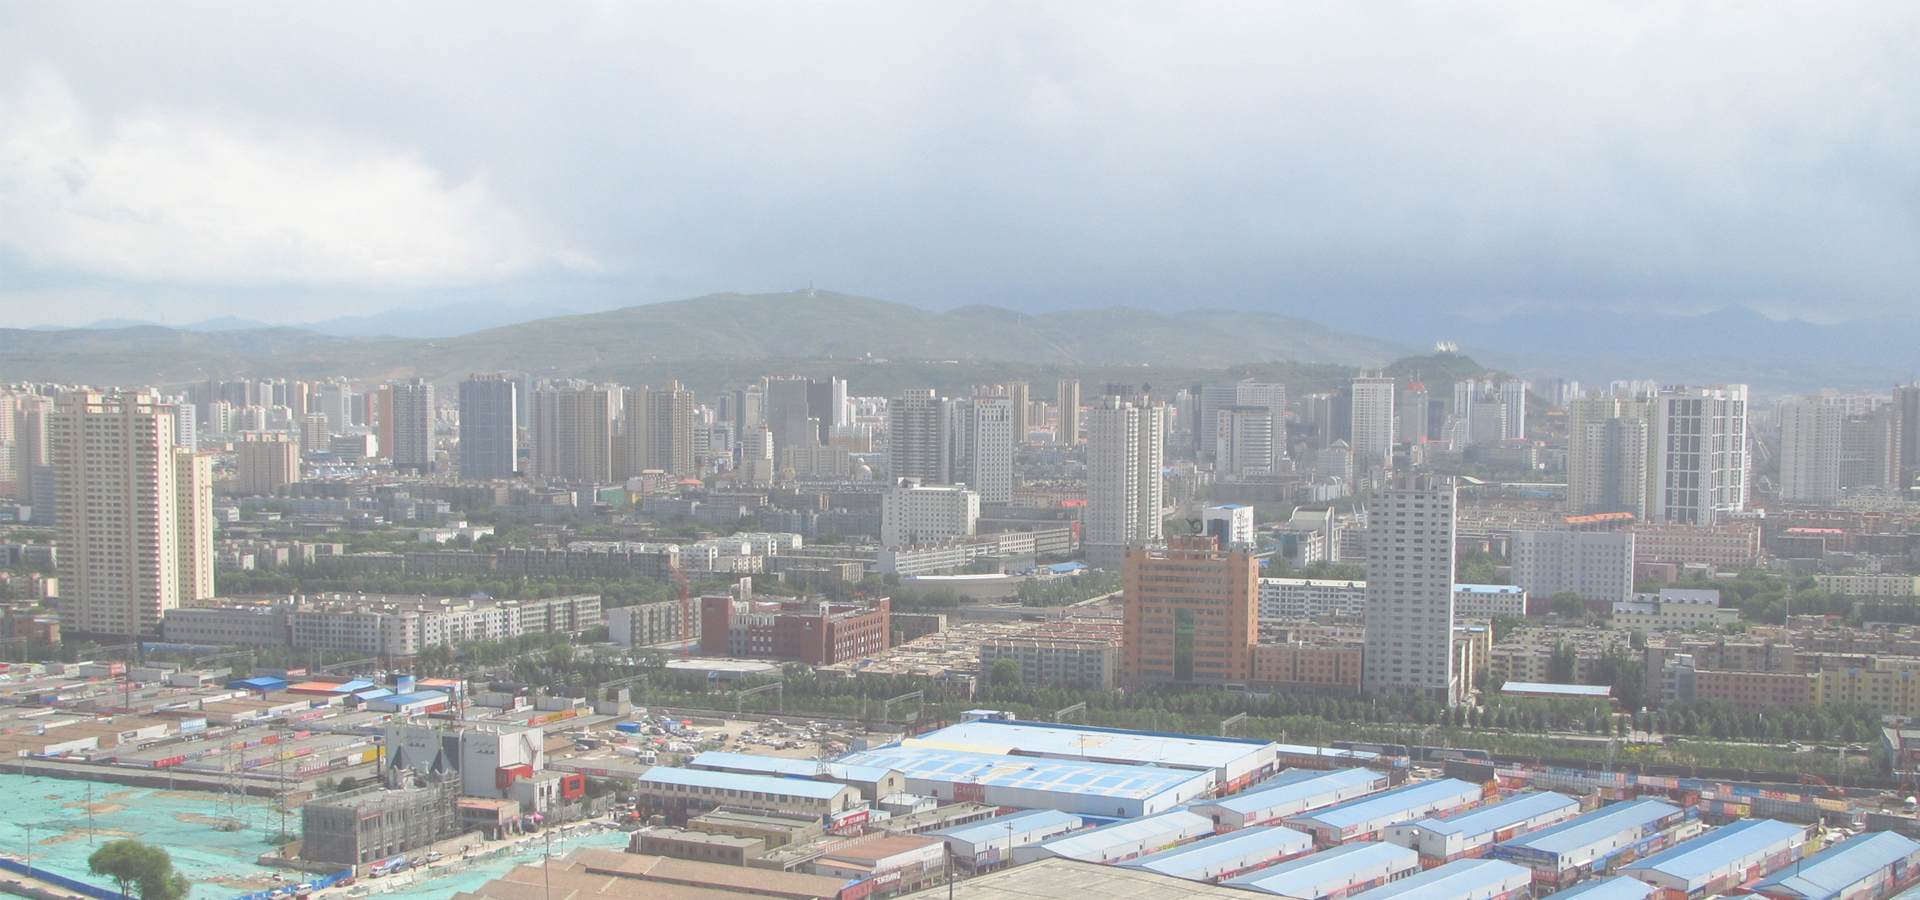 <b>Xining, Qinghai Province, China</b>